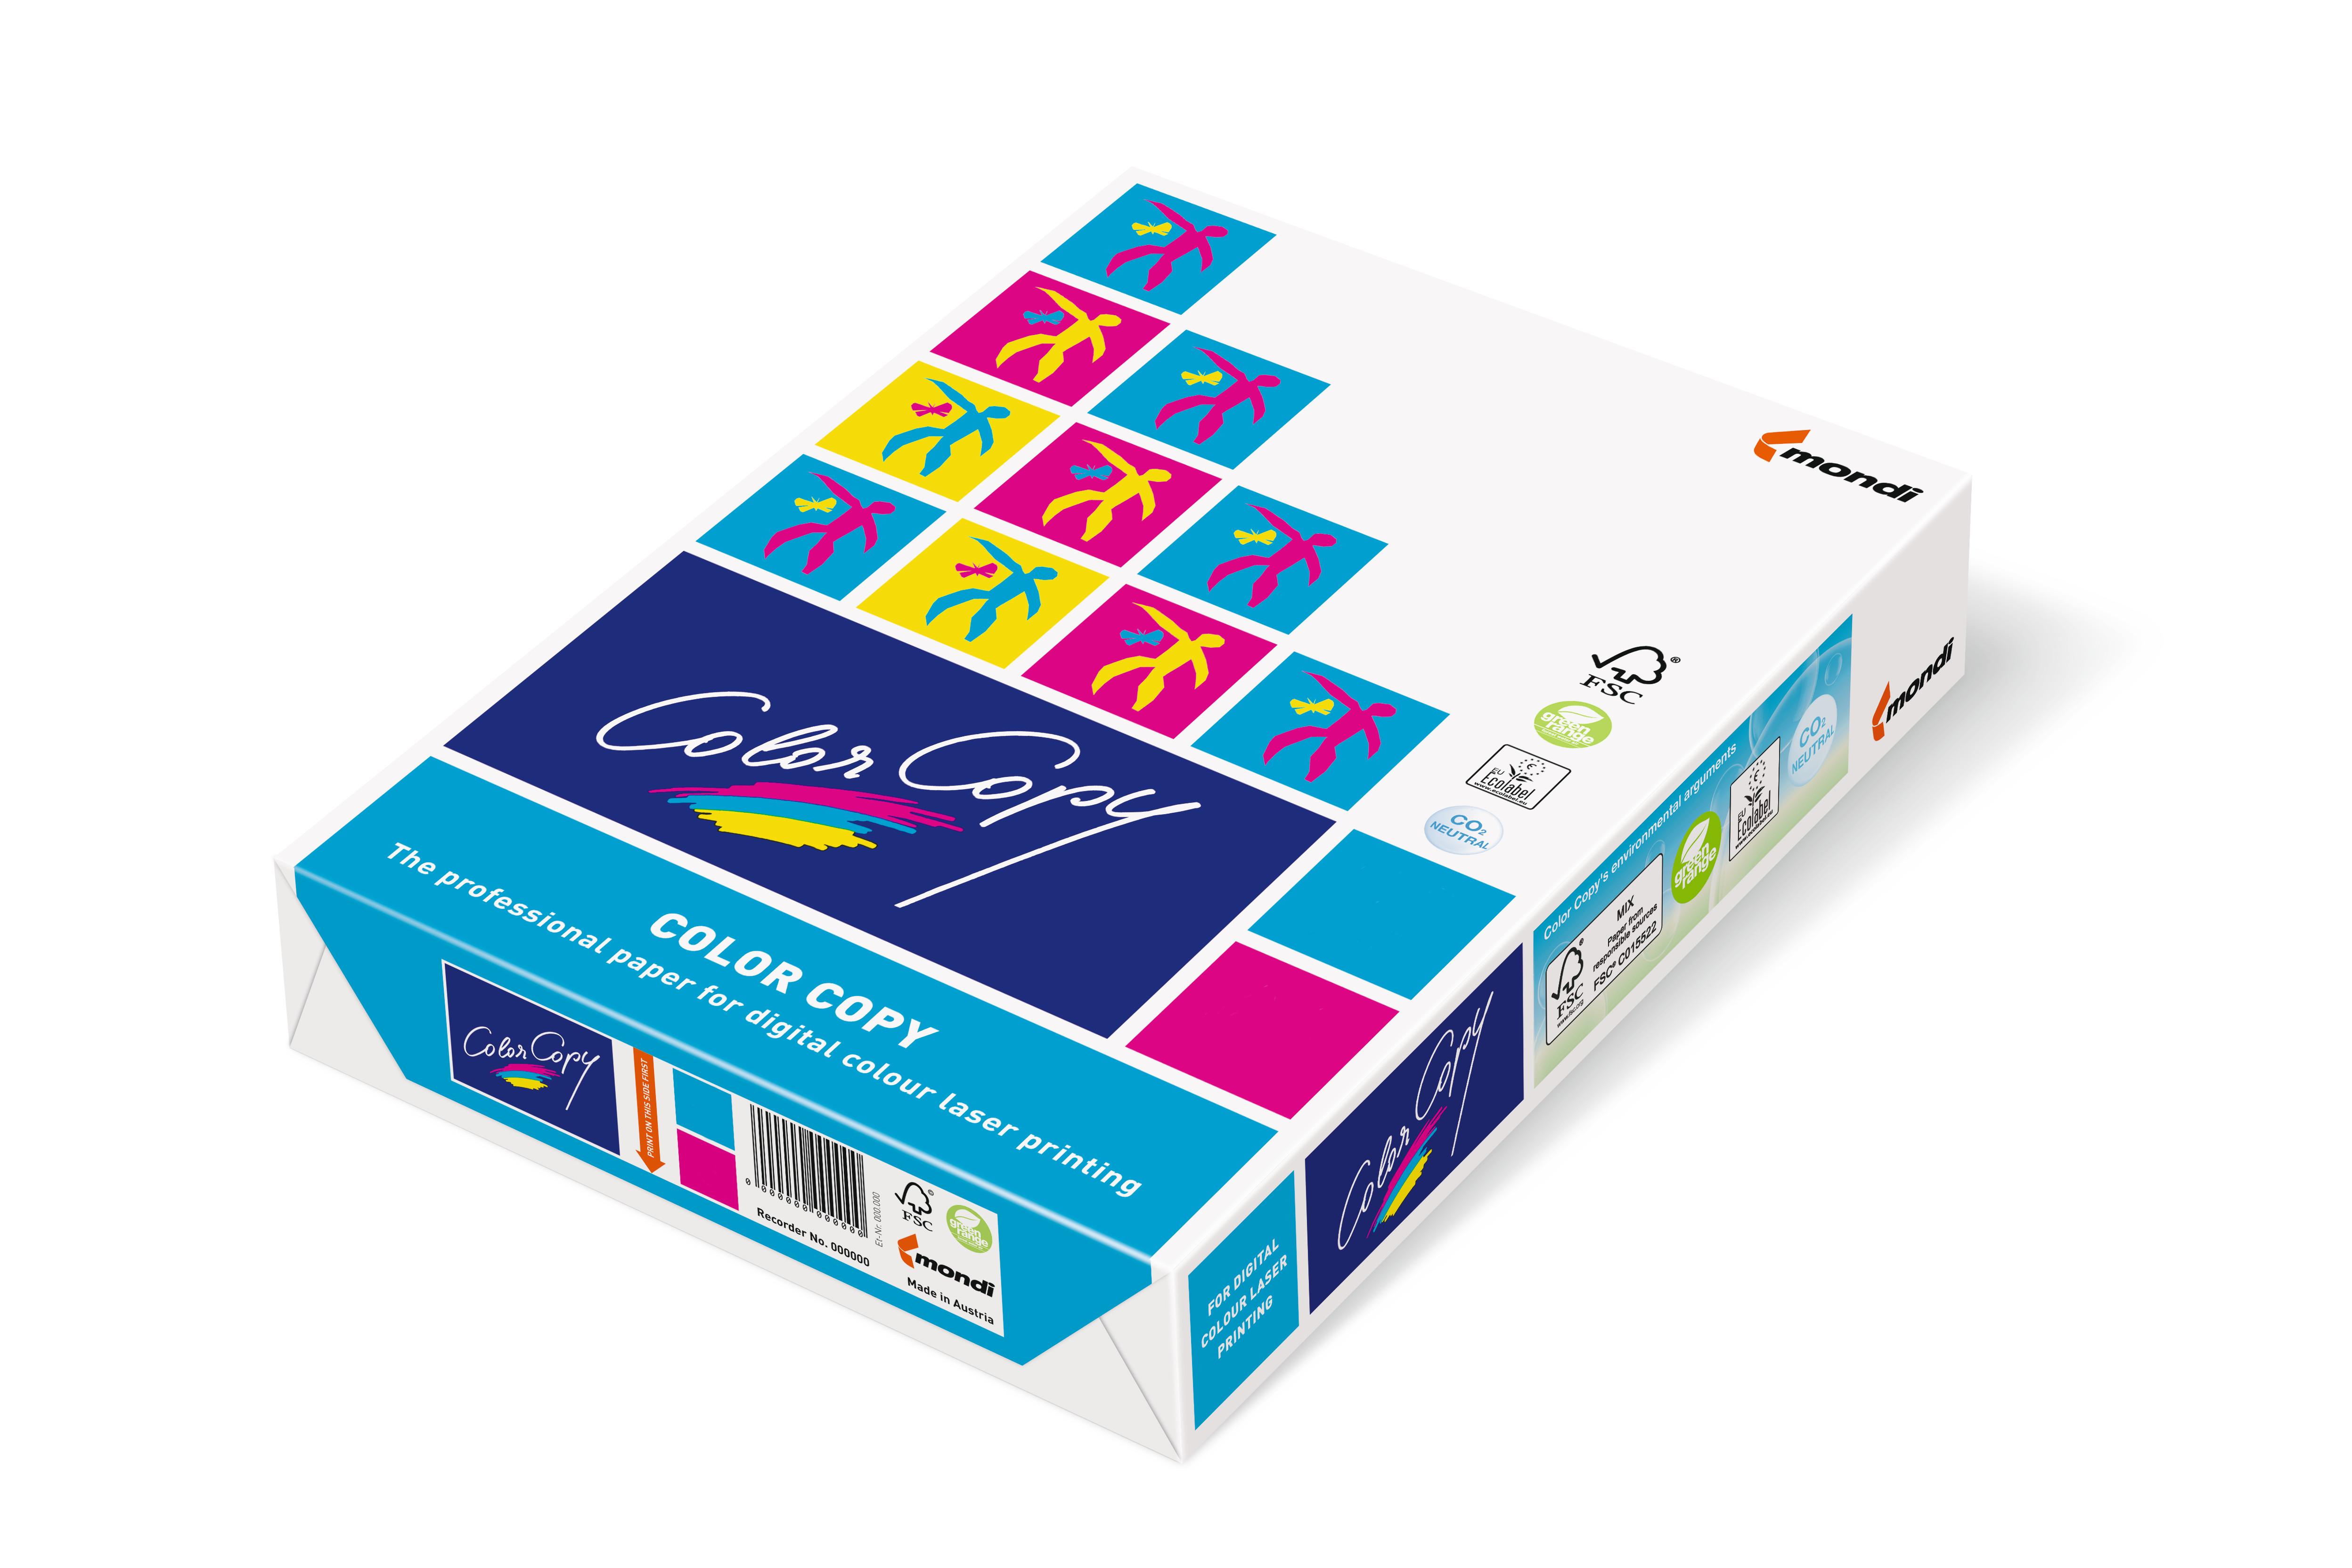 Mondi Color Copy 220 g/m² DIN-A3 250 Blatt